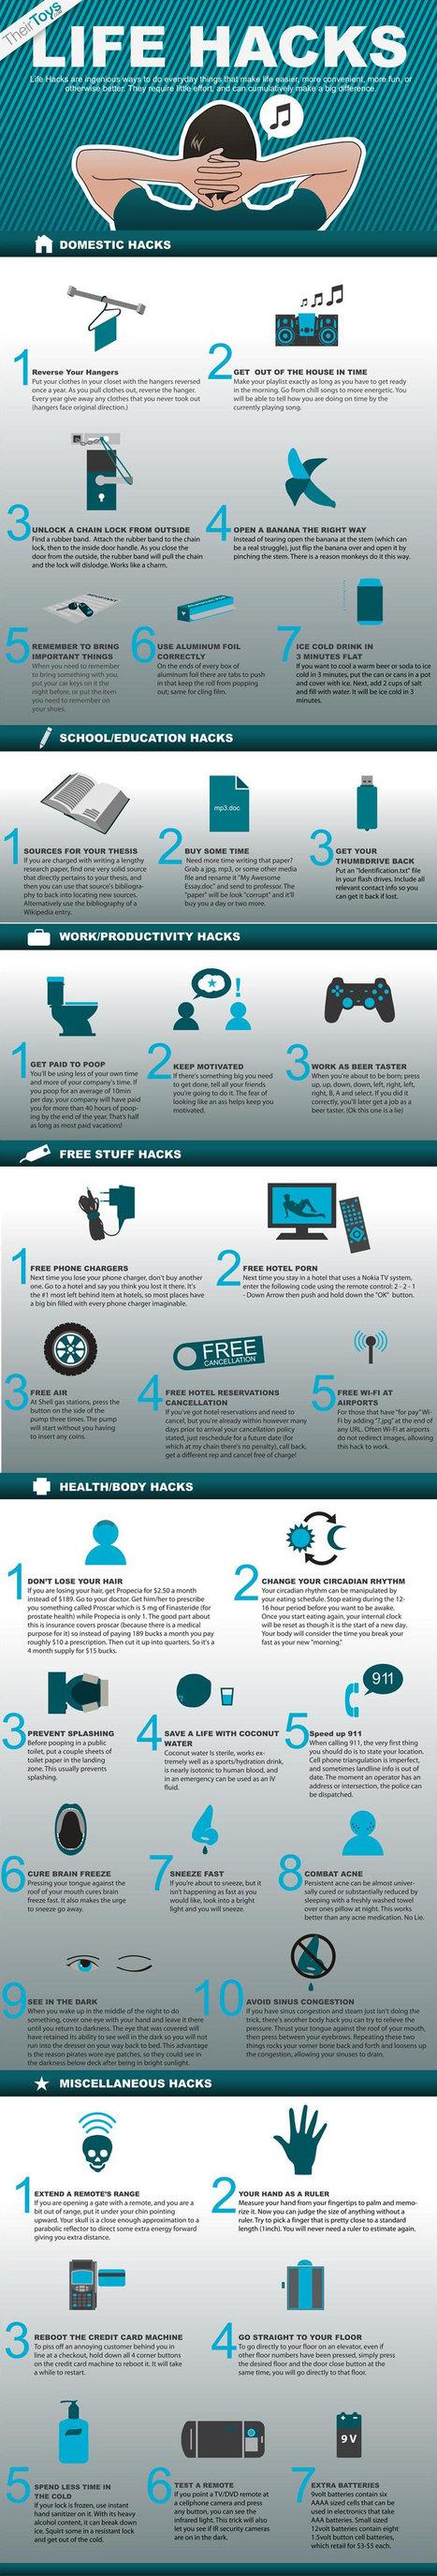 Life Hacks [infographic] | EPIC Infographic | Scoop.it